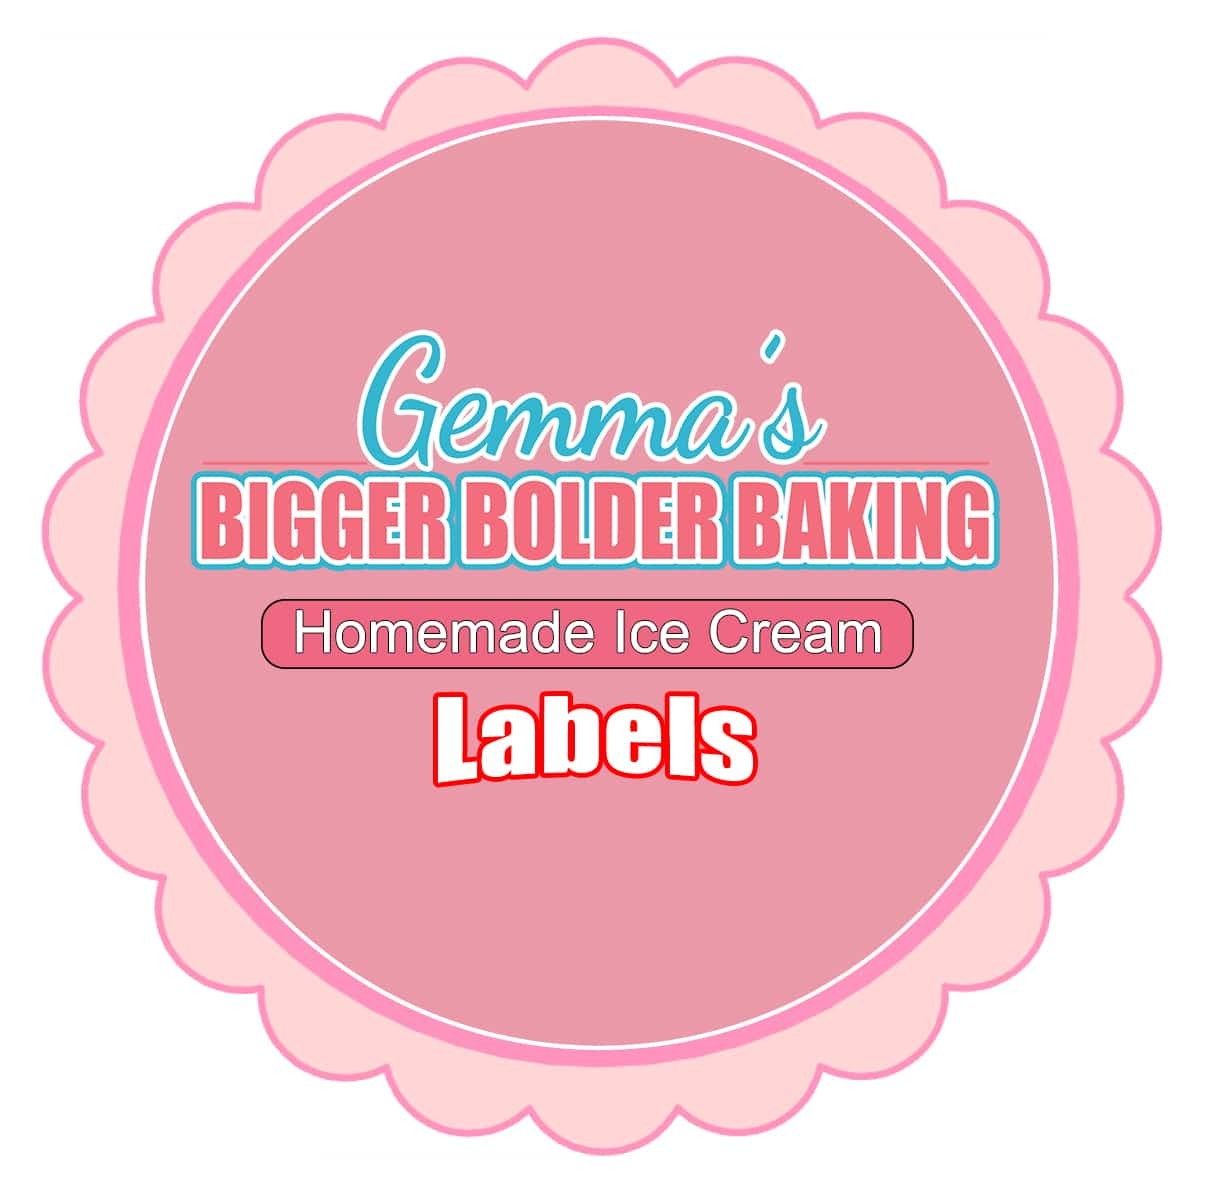 ice cream labels template  Homemade Ice Cream Label Template - Gemma's Bigger Bolder ..